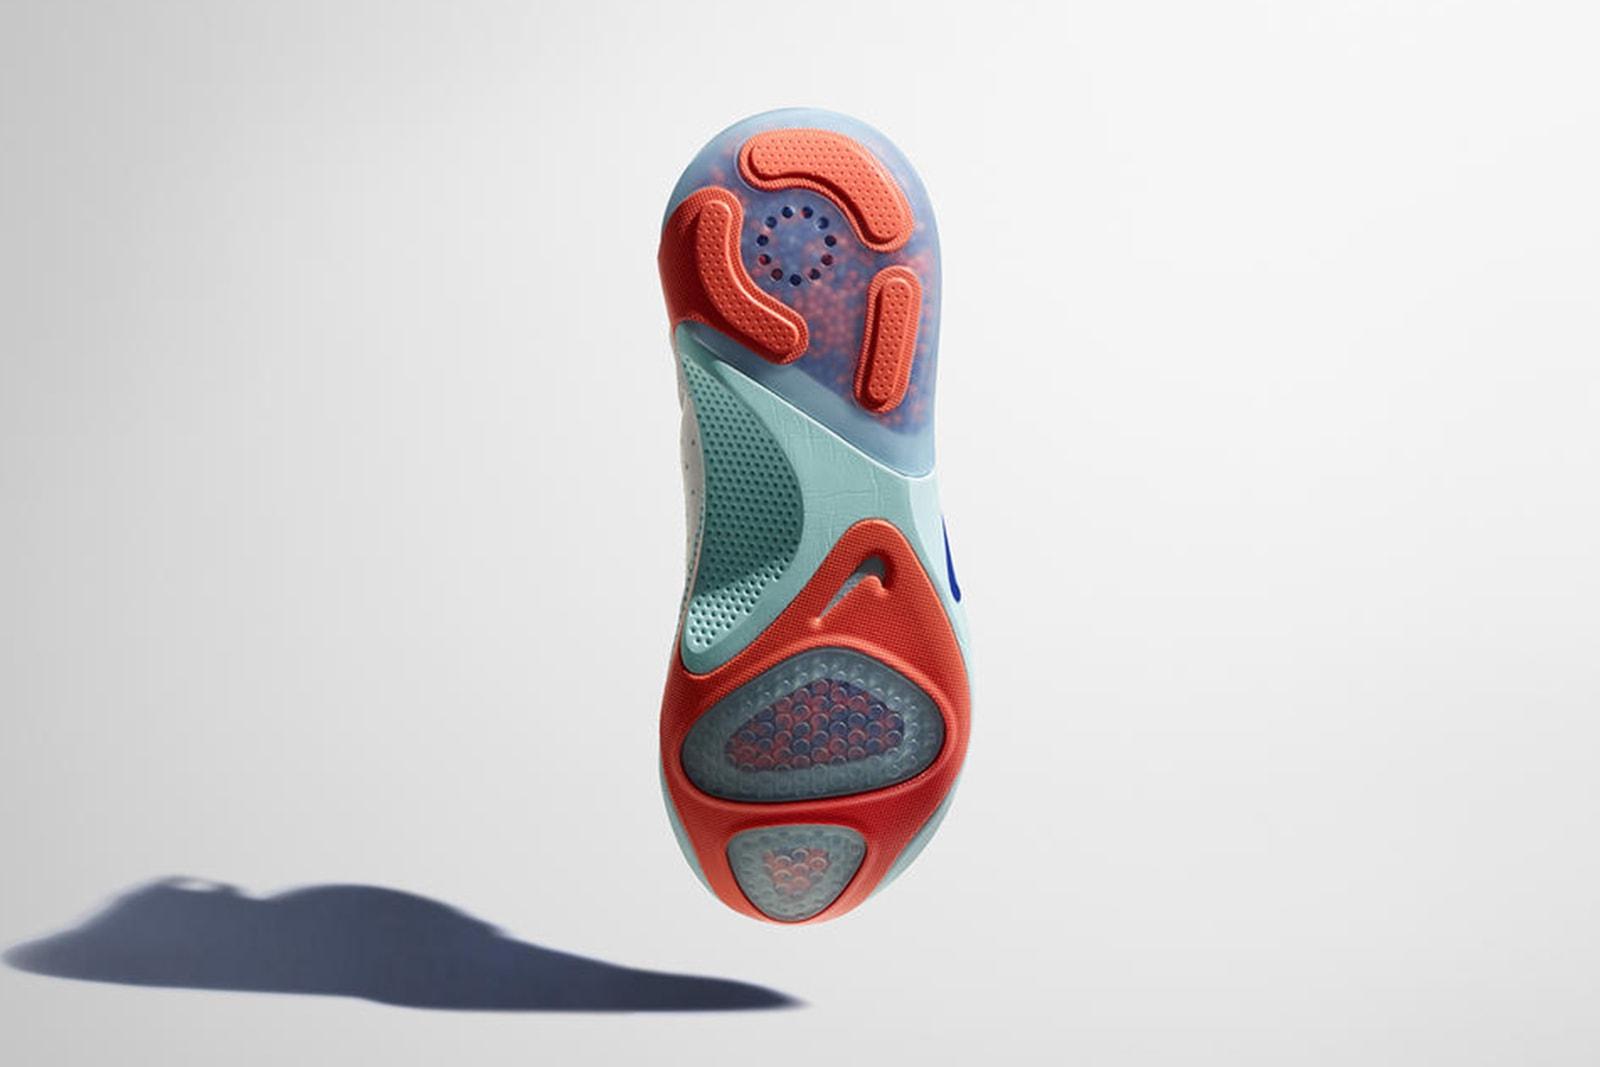 nike ナイキ ビーズ 最新 システム ナイキ ジョイライドnike joyride flyknit run ラン スニーカー シューズ フットウェア 靴